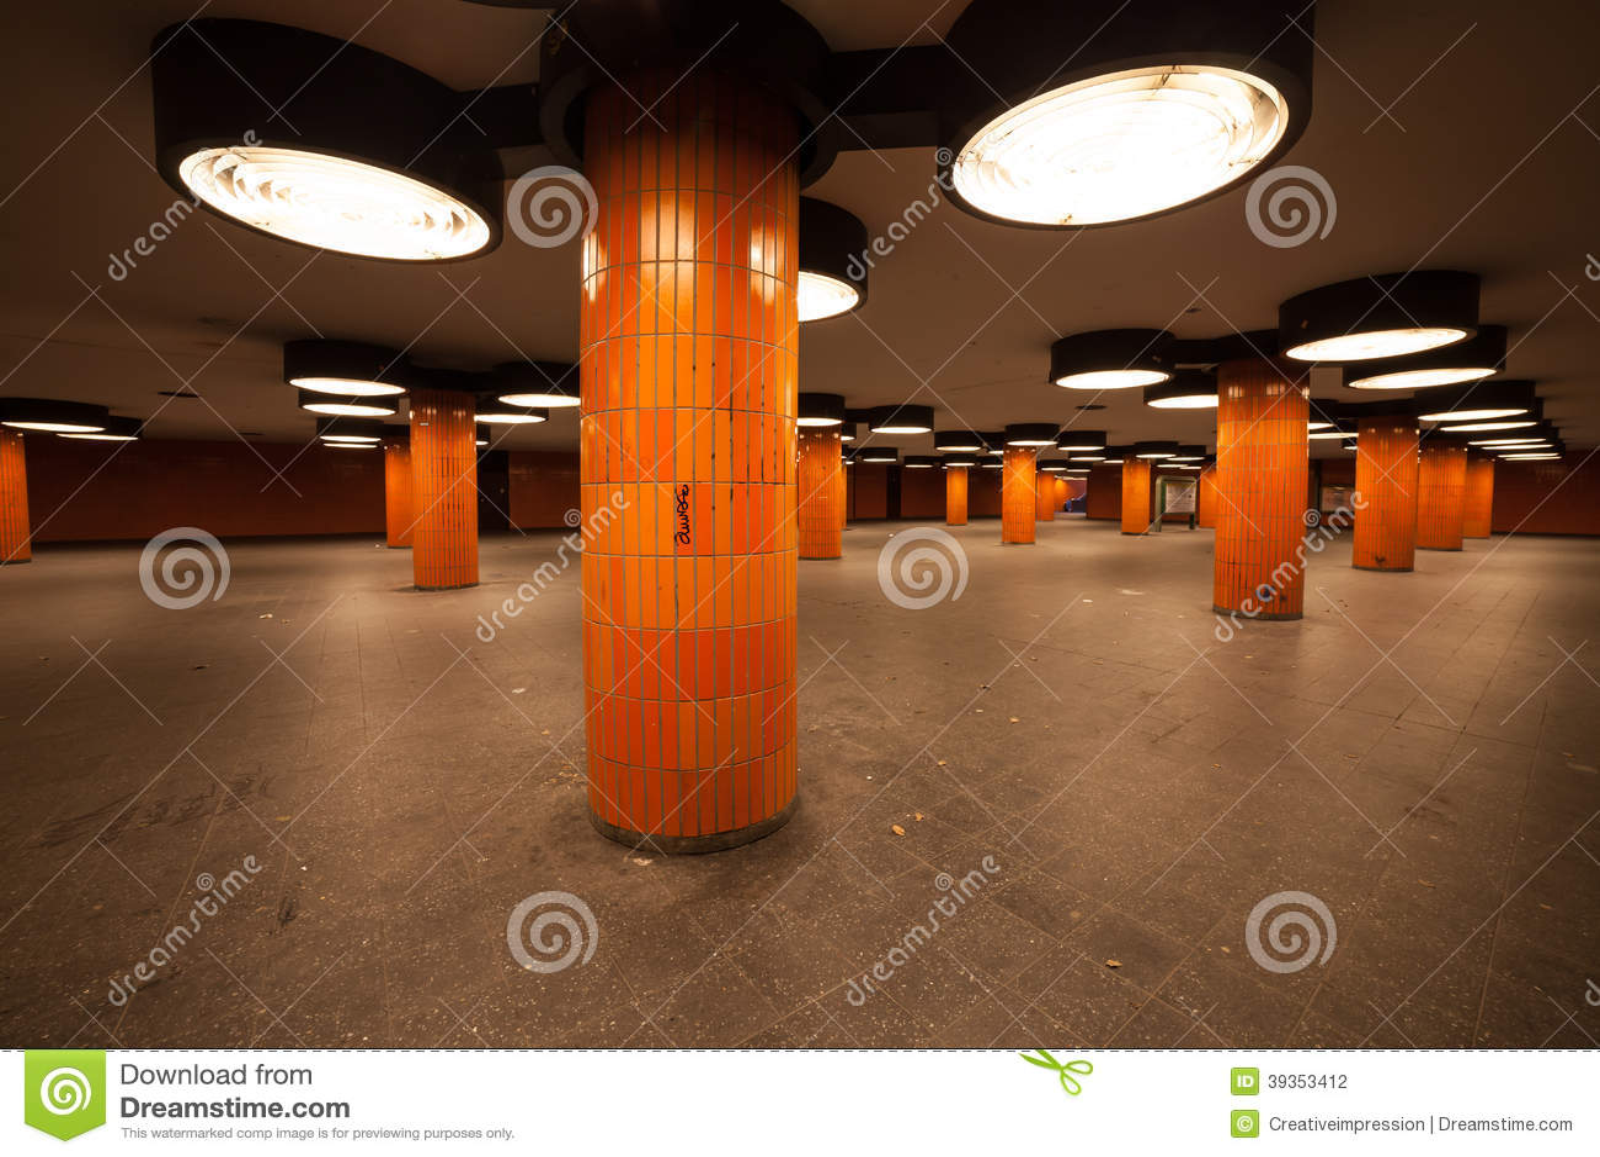 passage souterrain berlin photo stock image 39353412. Black Bedroom Furniture Sets. Home Design Ideas